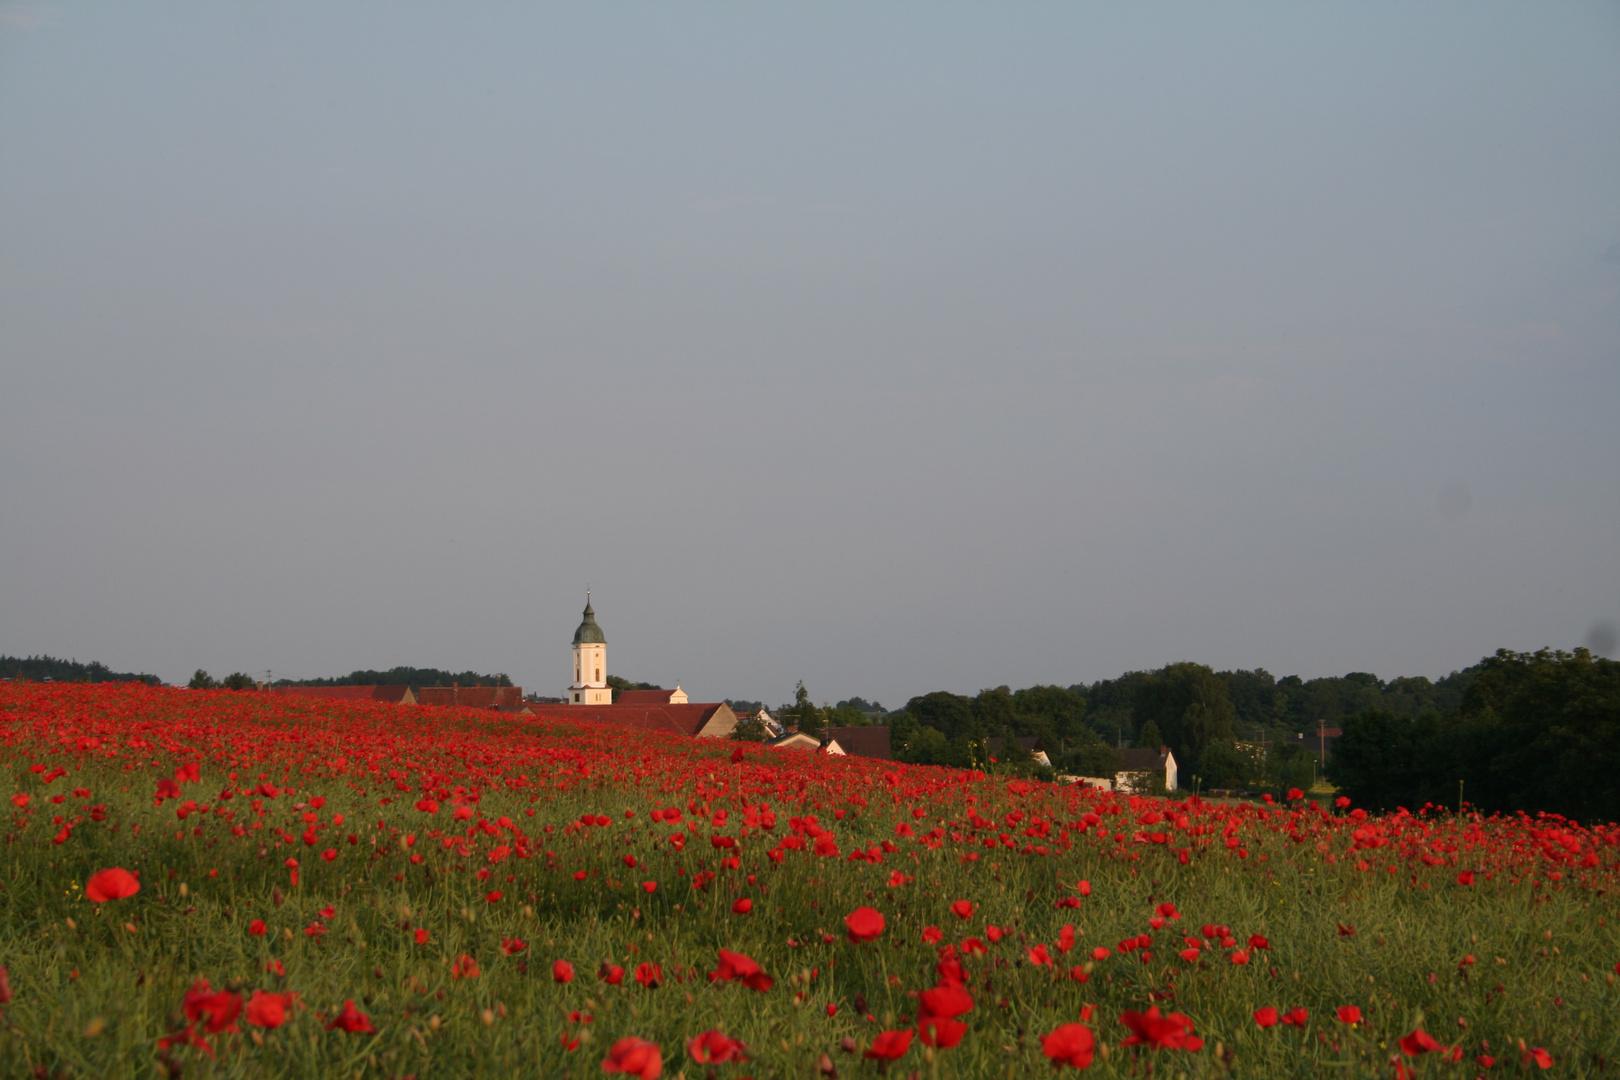 Mohnfeld am Ortsrand